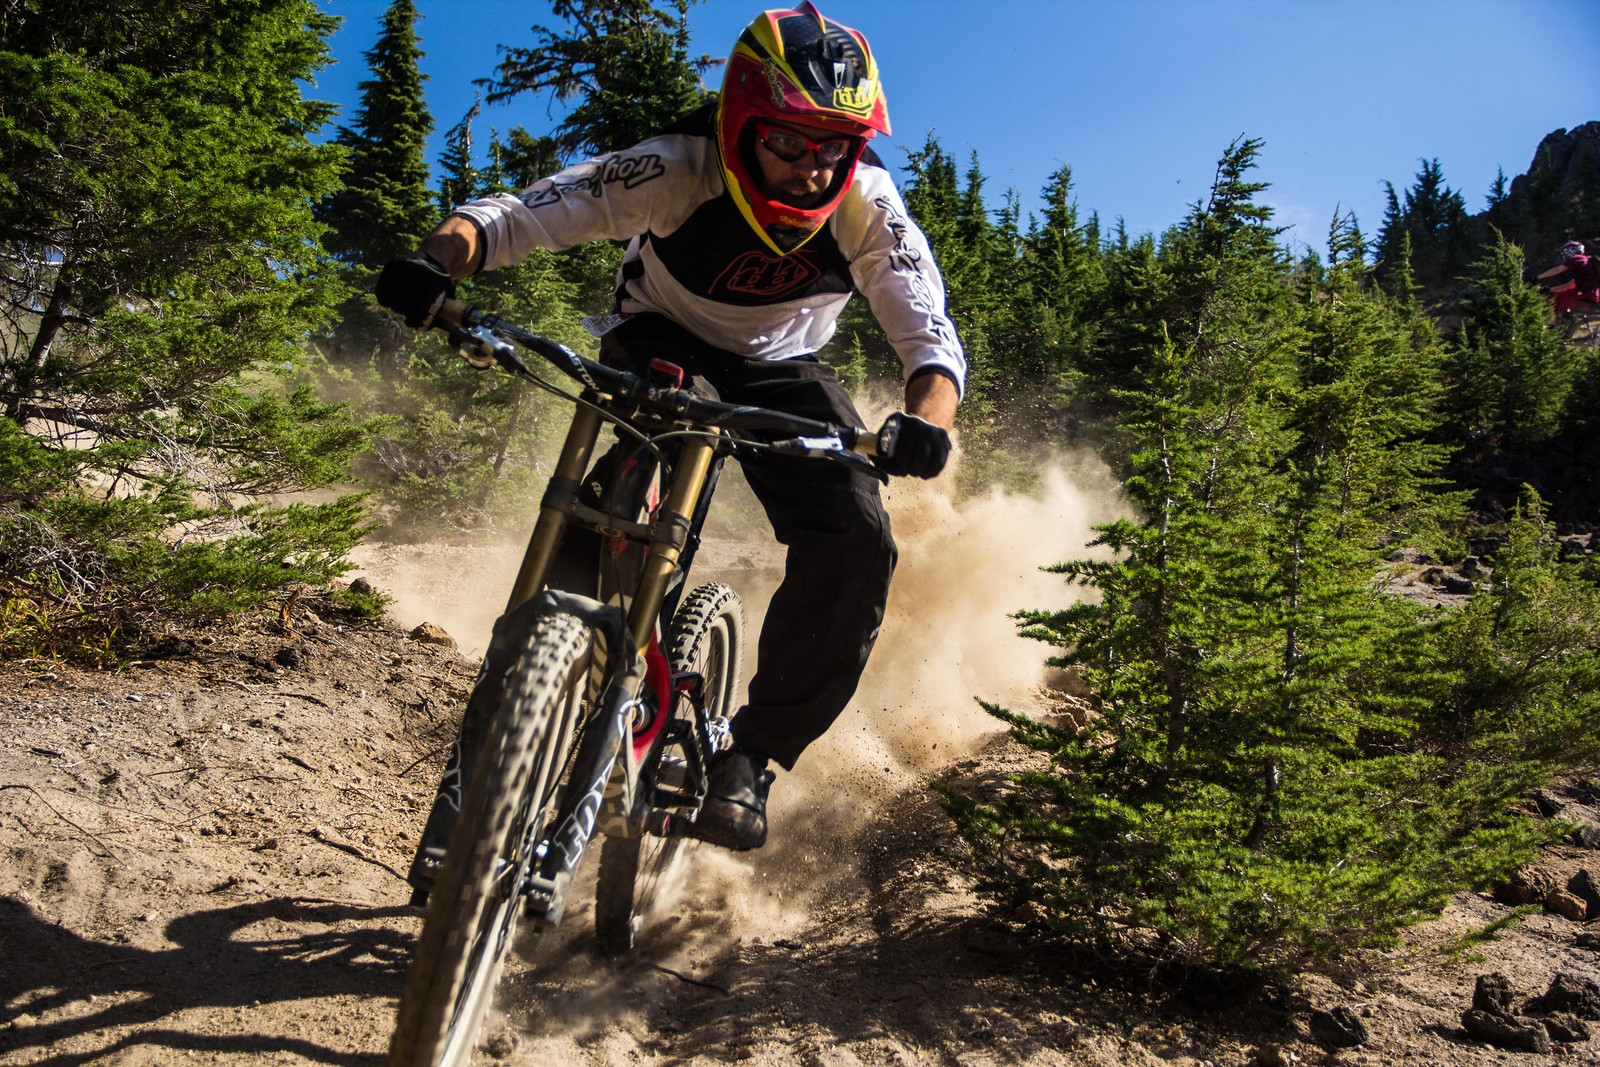 Bache - Yuroshek - Mountain Biking Pictures - Vital MTB